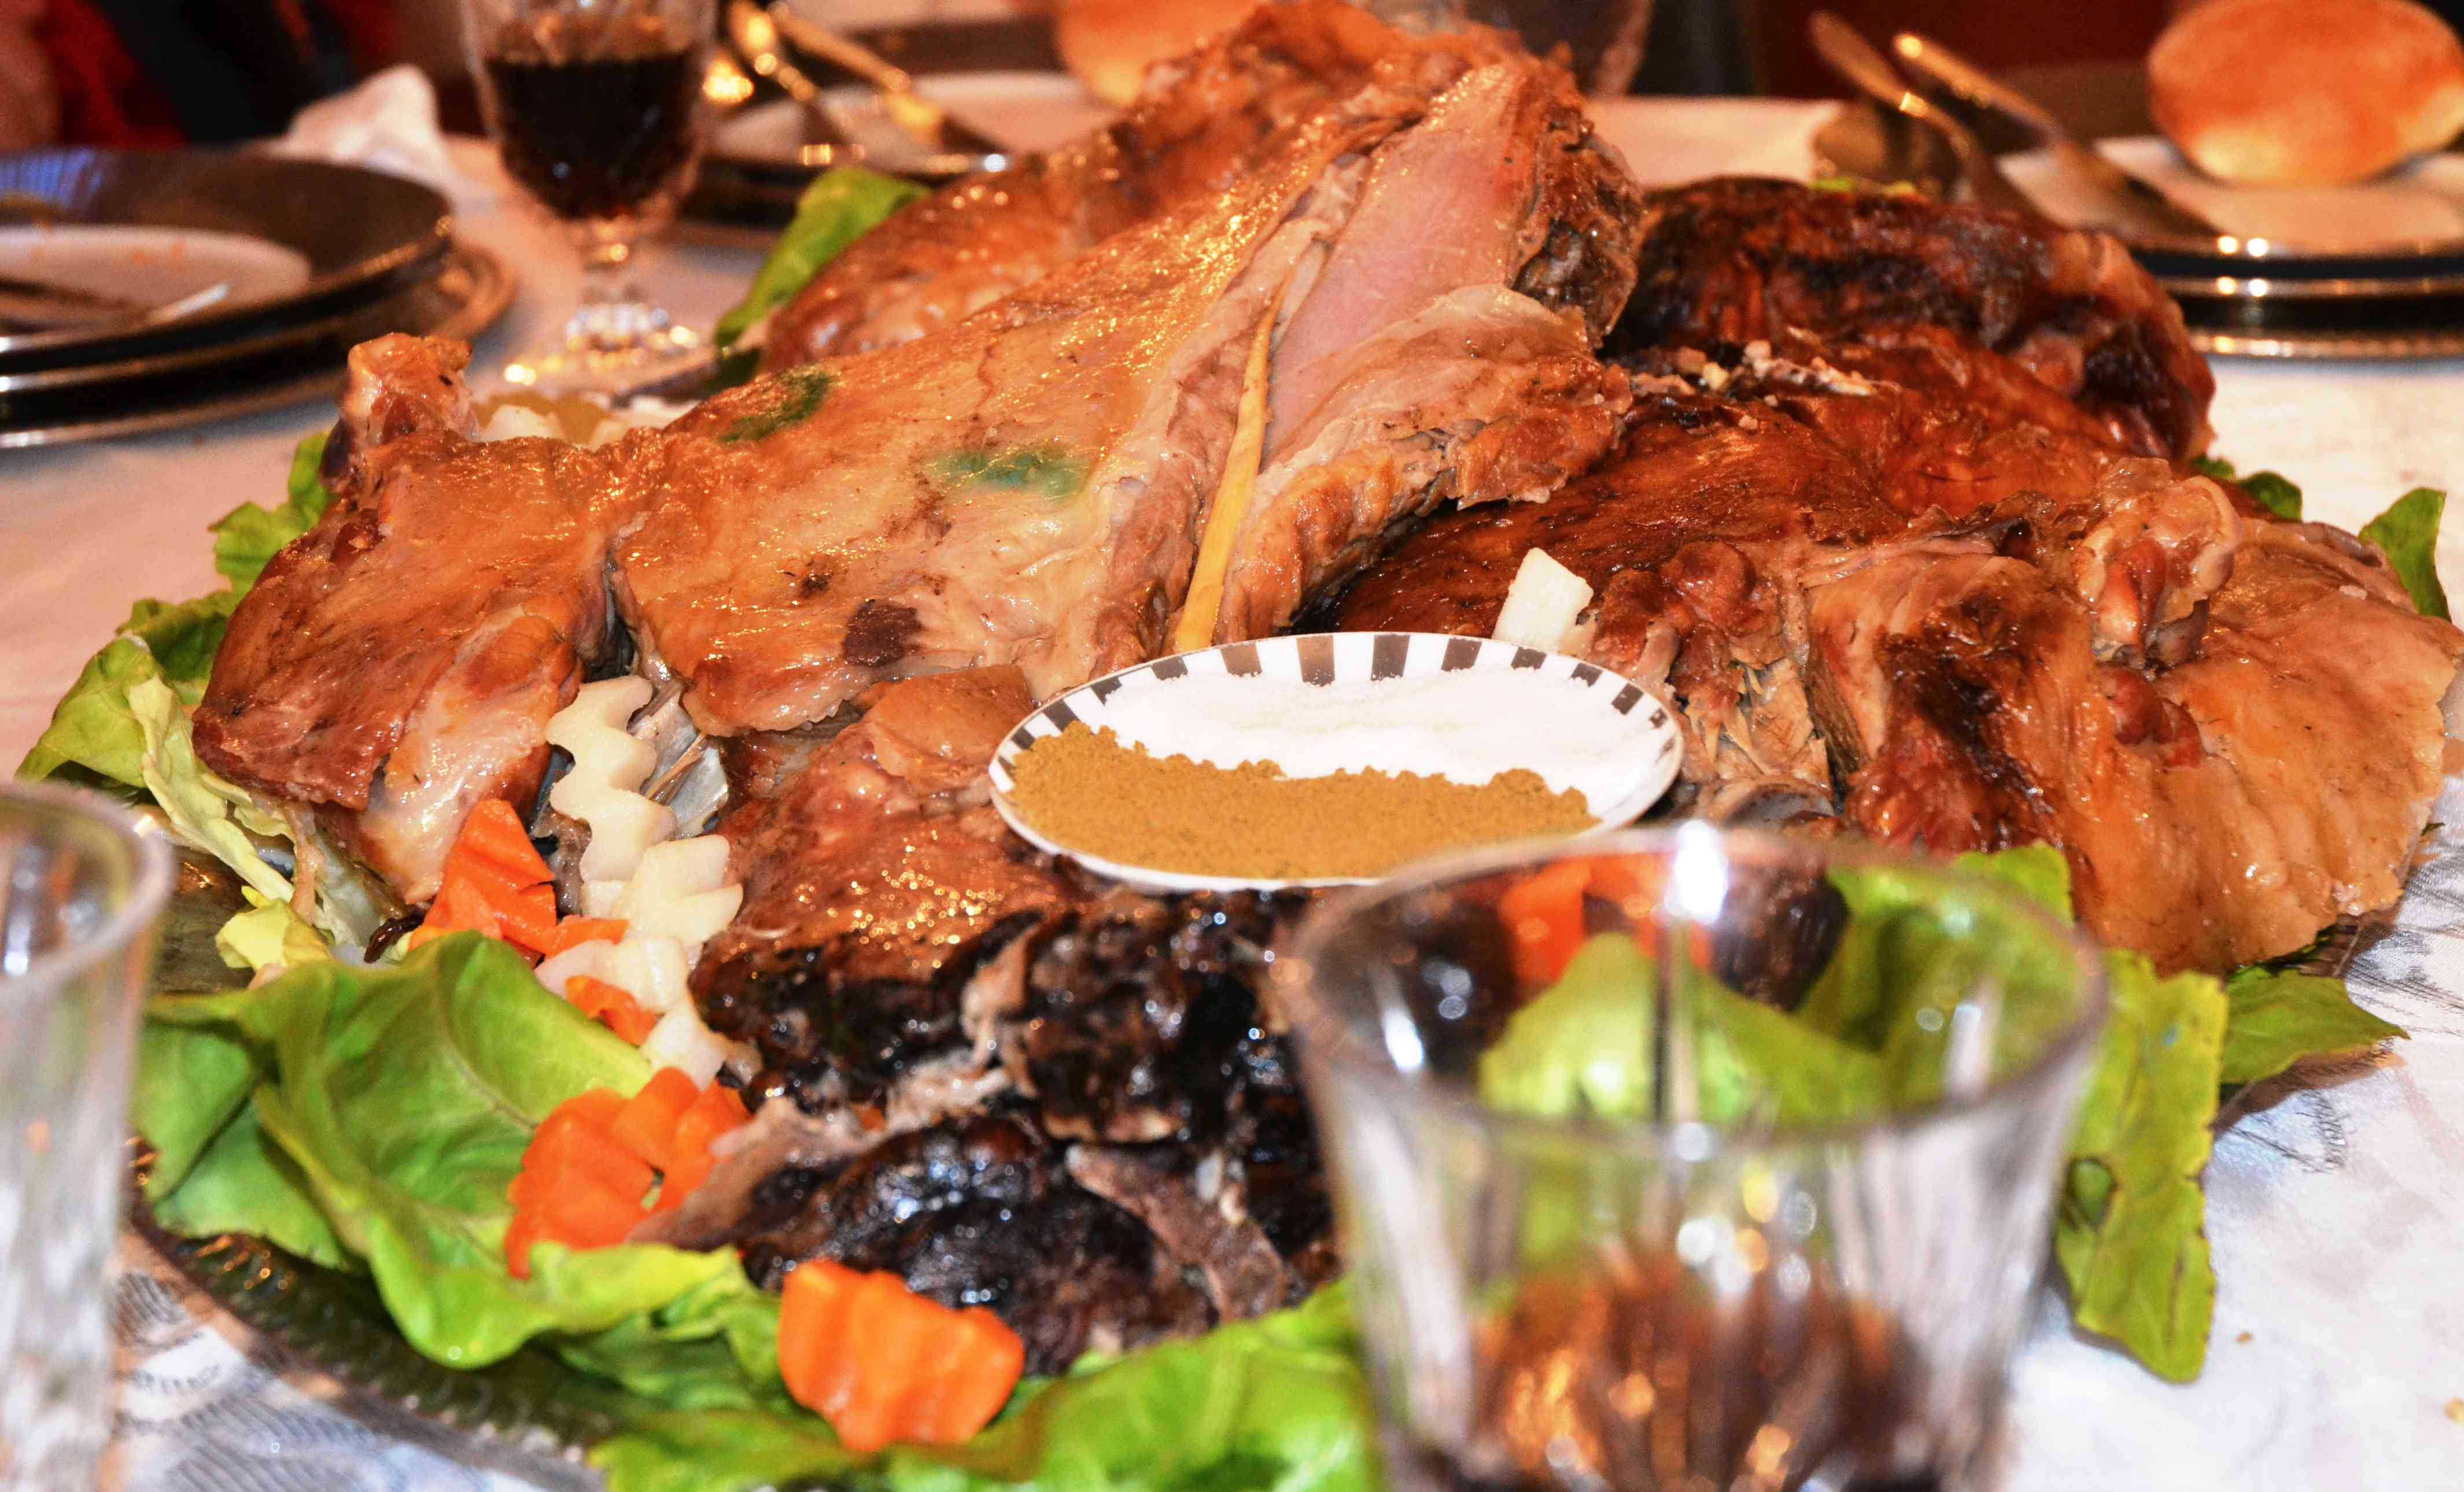 Moroccan mechoui: roasted lamb